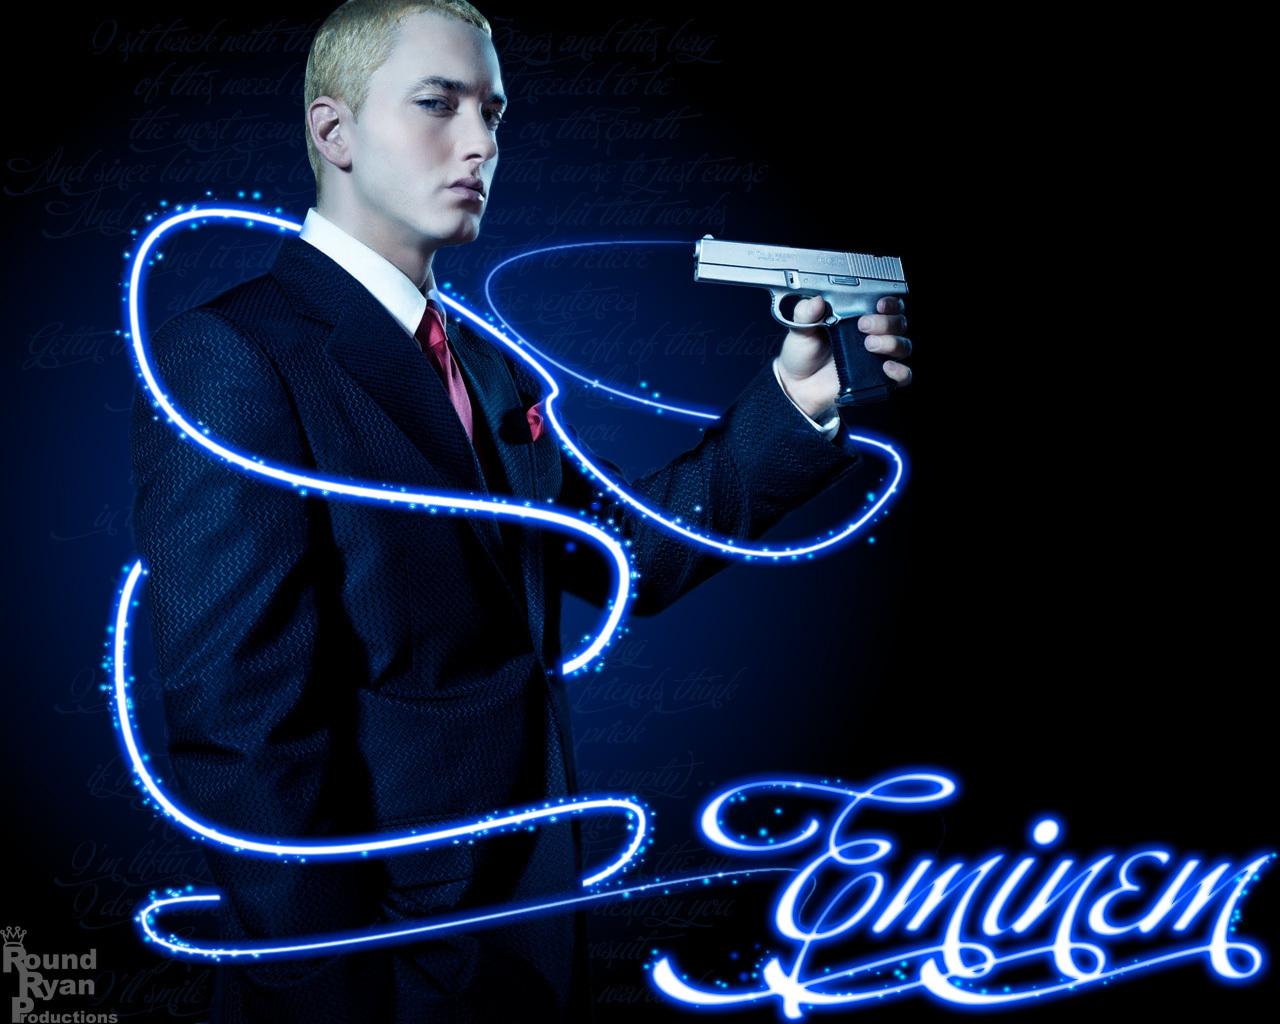 Eminem - EMINEM Wallpaper (9776558) - Fanpop